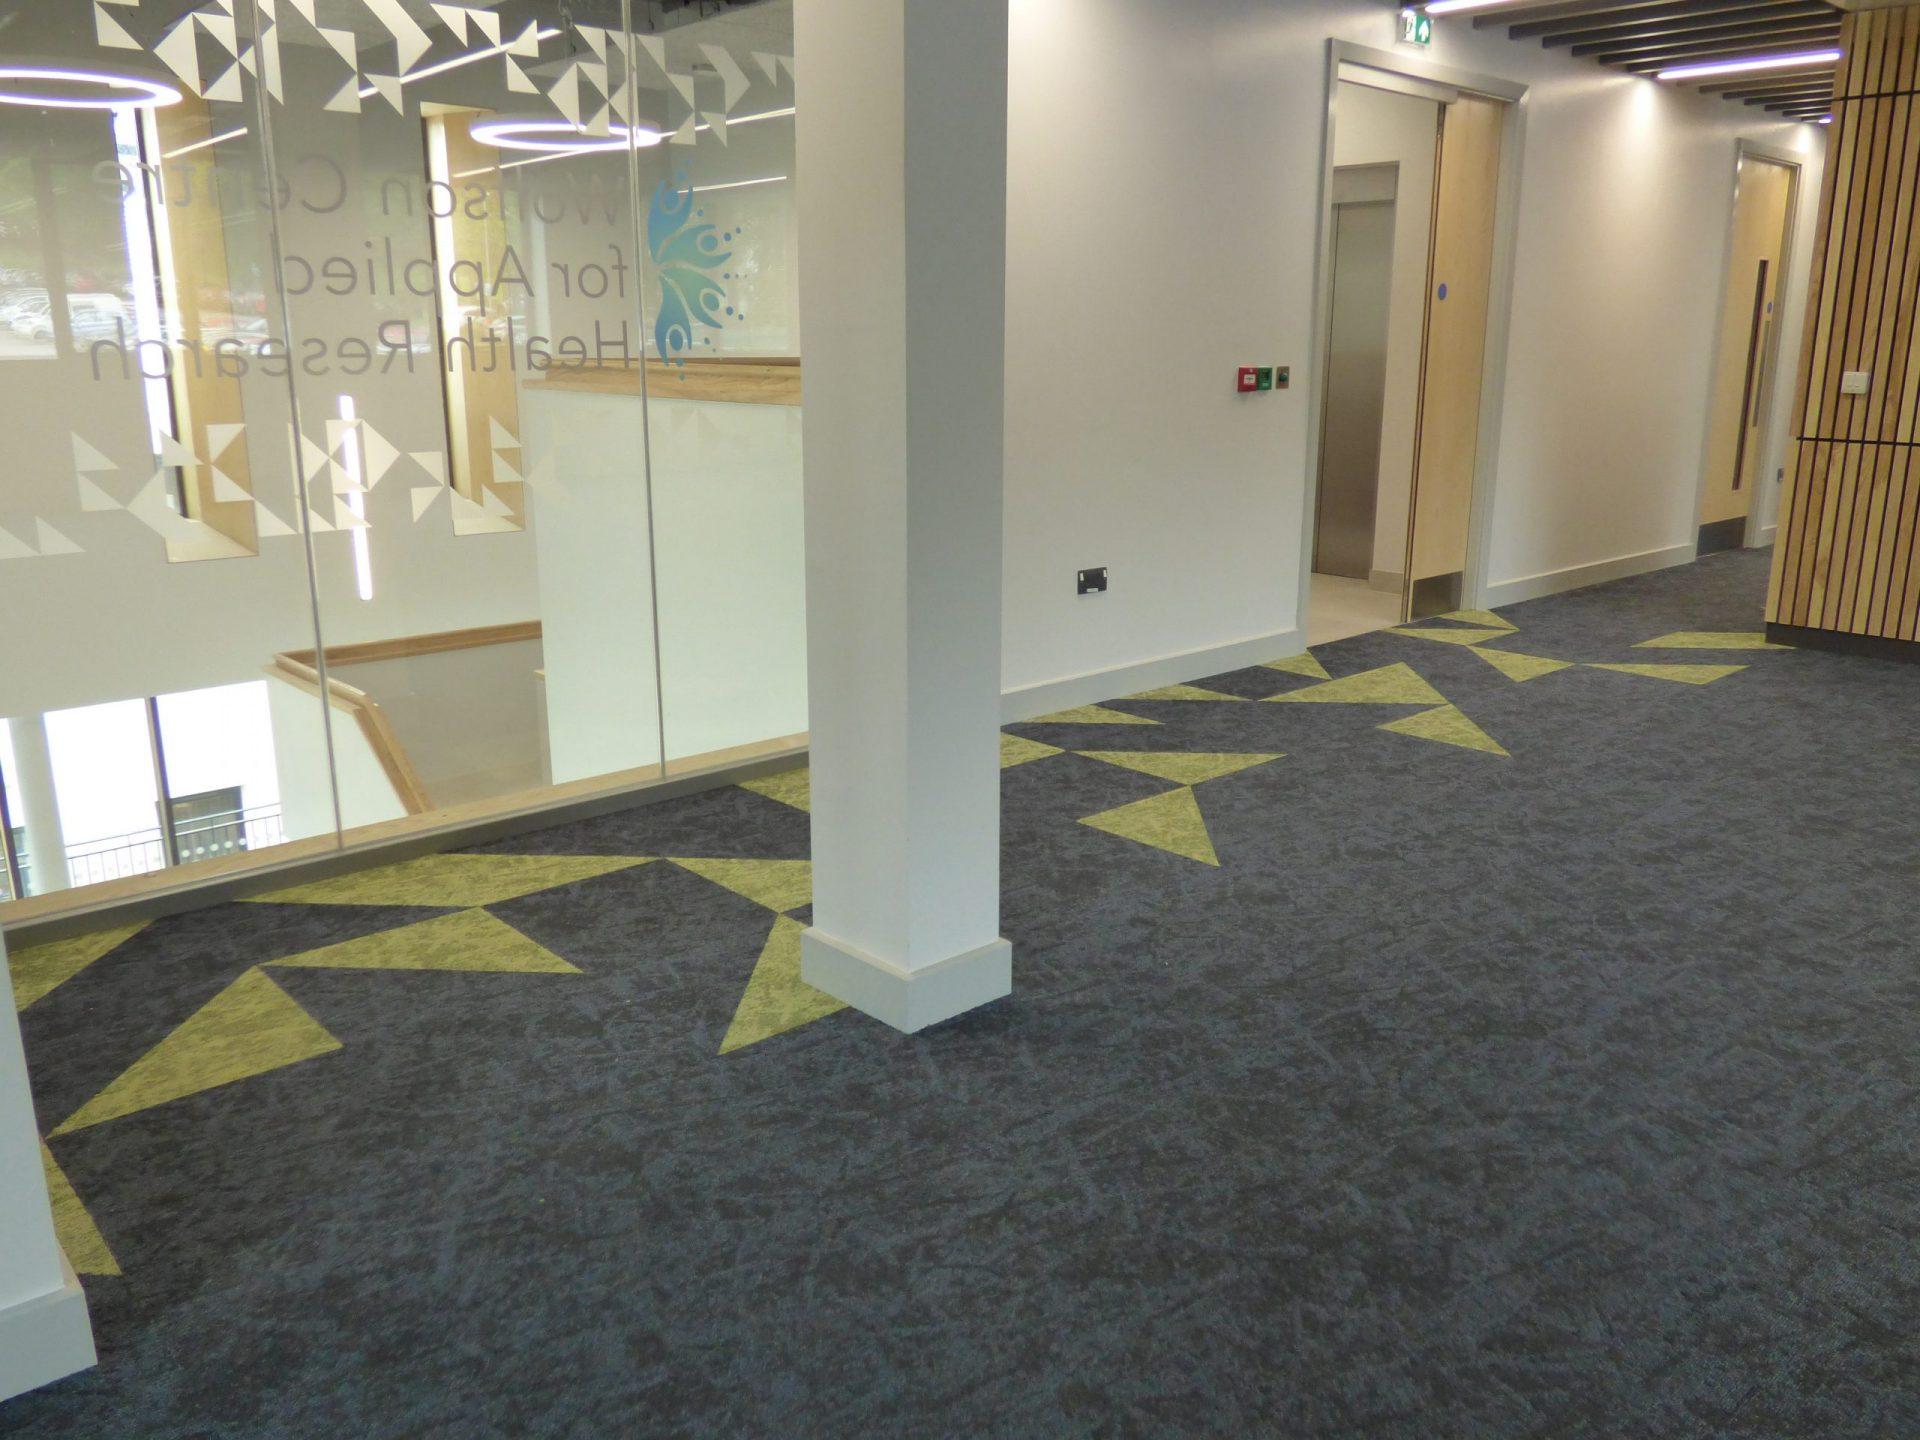 BRI CAHR Carpet Tiles (61)